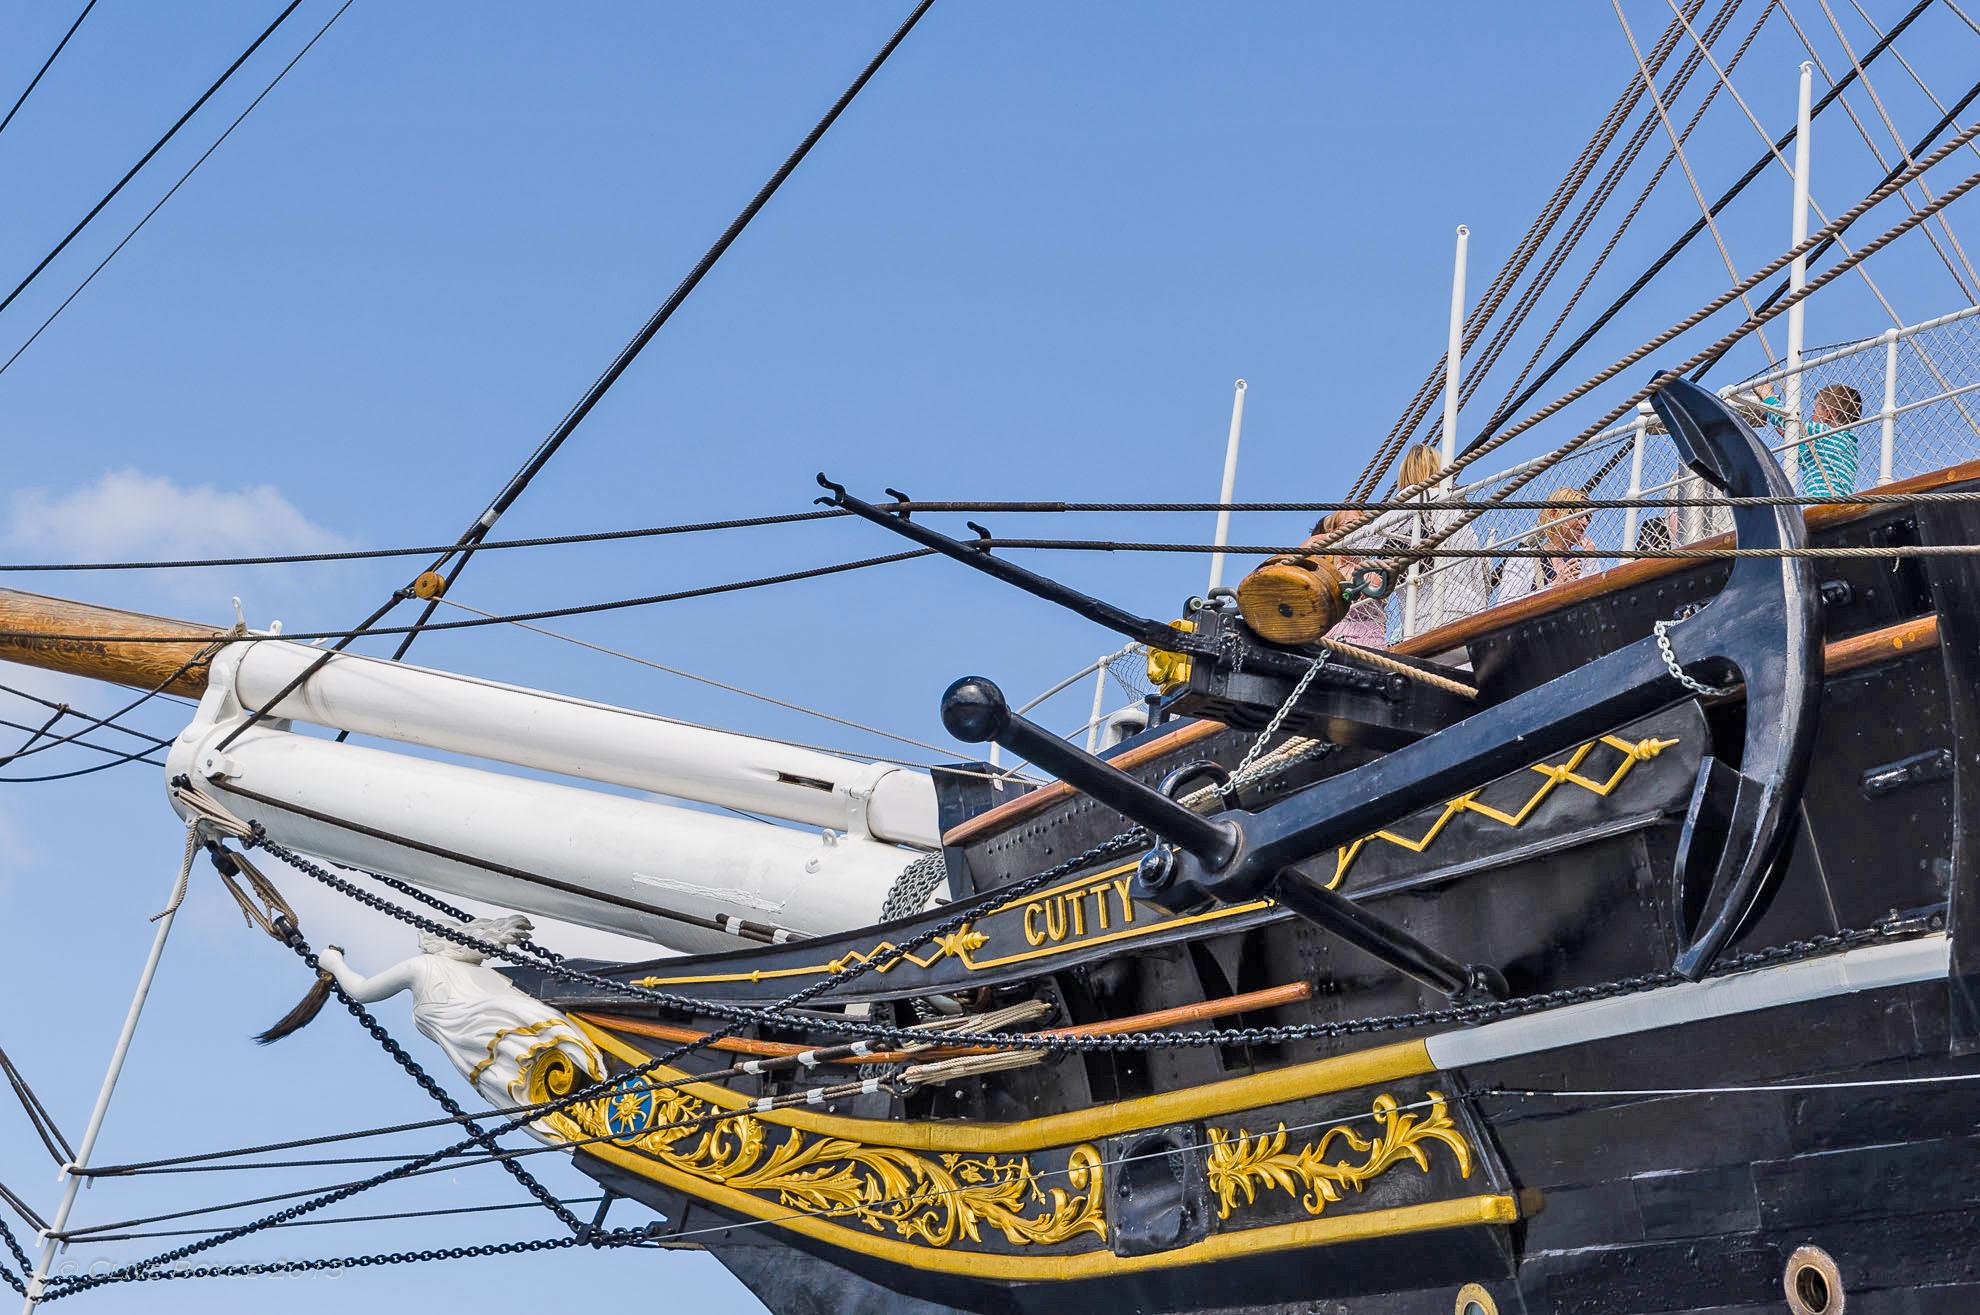 Cutty Sark, built 1869 Wooden Clipper Ship Anchor & Ship in London, England